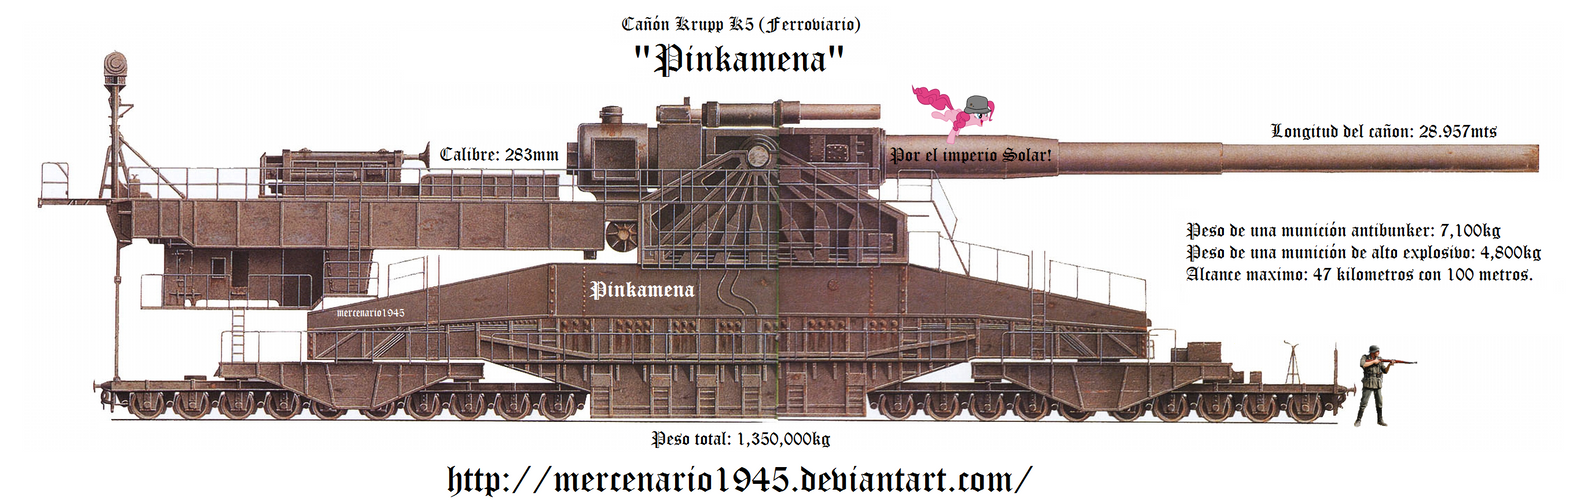 Pinkamena Canon Krupp K5 Super Duper Party Cannon by mercenario1945